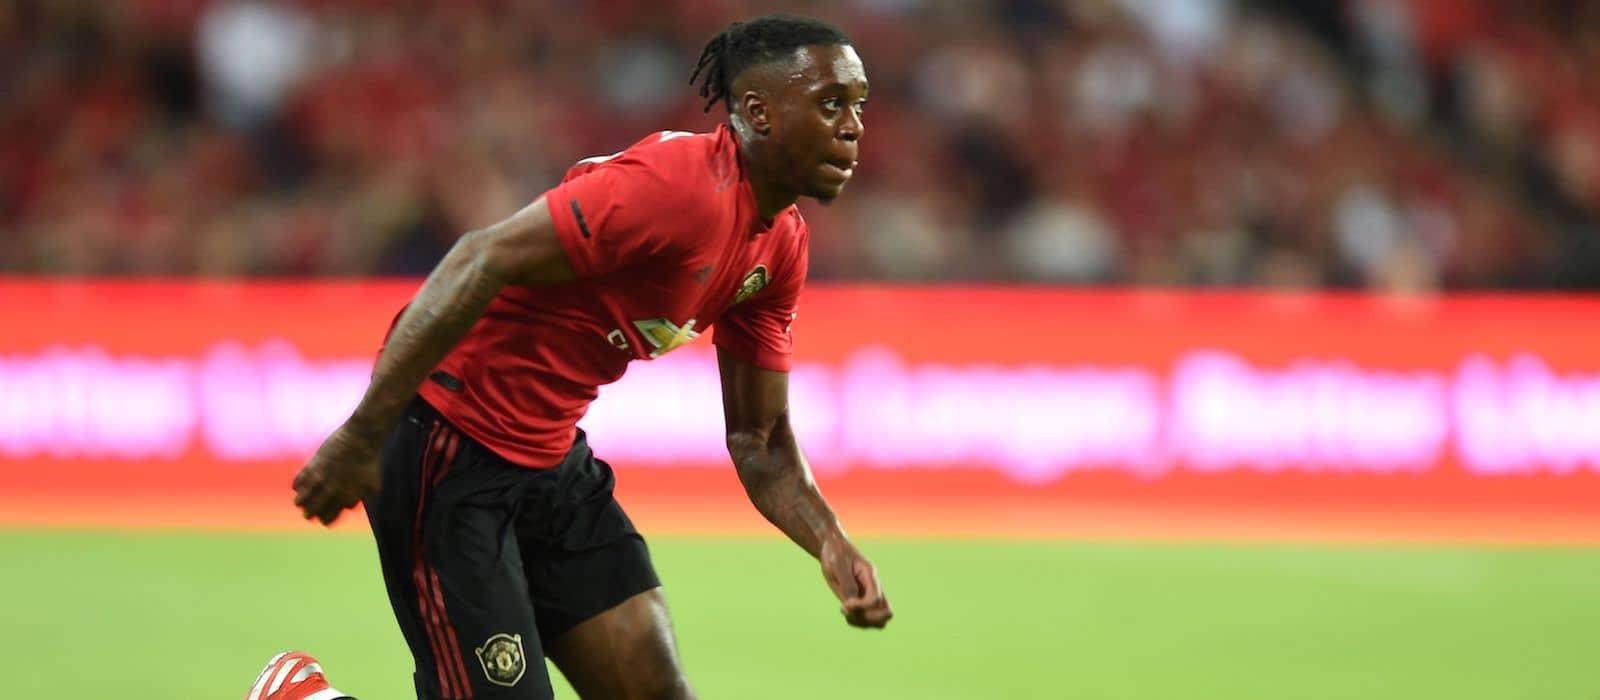 Aaron Wan-Bissaka continues sensational pre-season form during win over Inter Milan